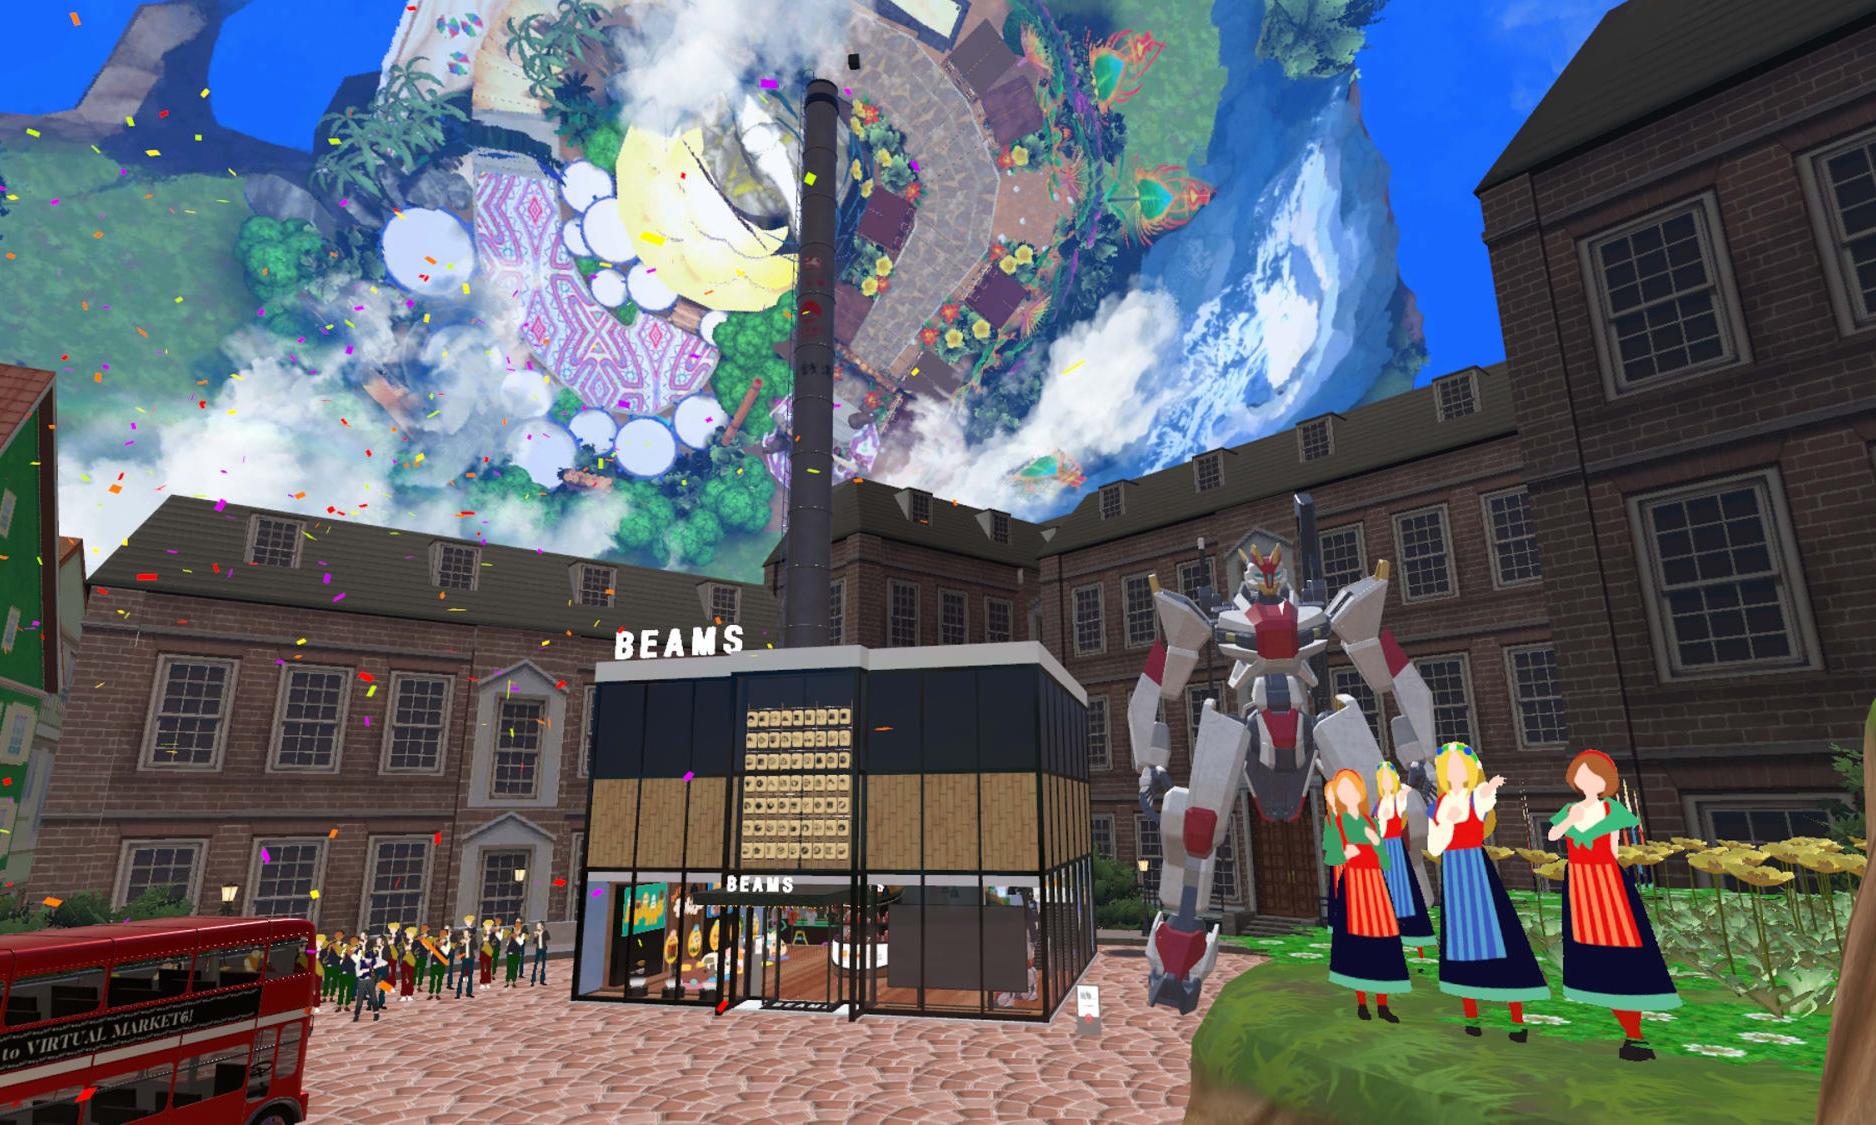 BEAMS Virtual Market 6 虚拟活动即将开催